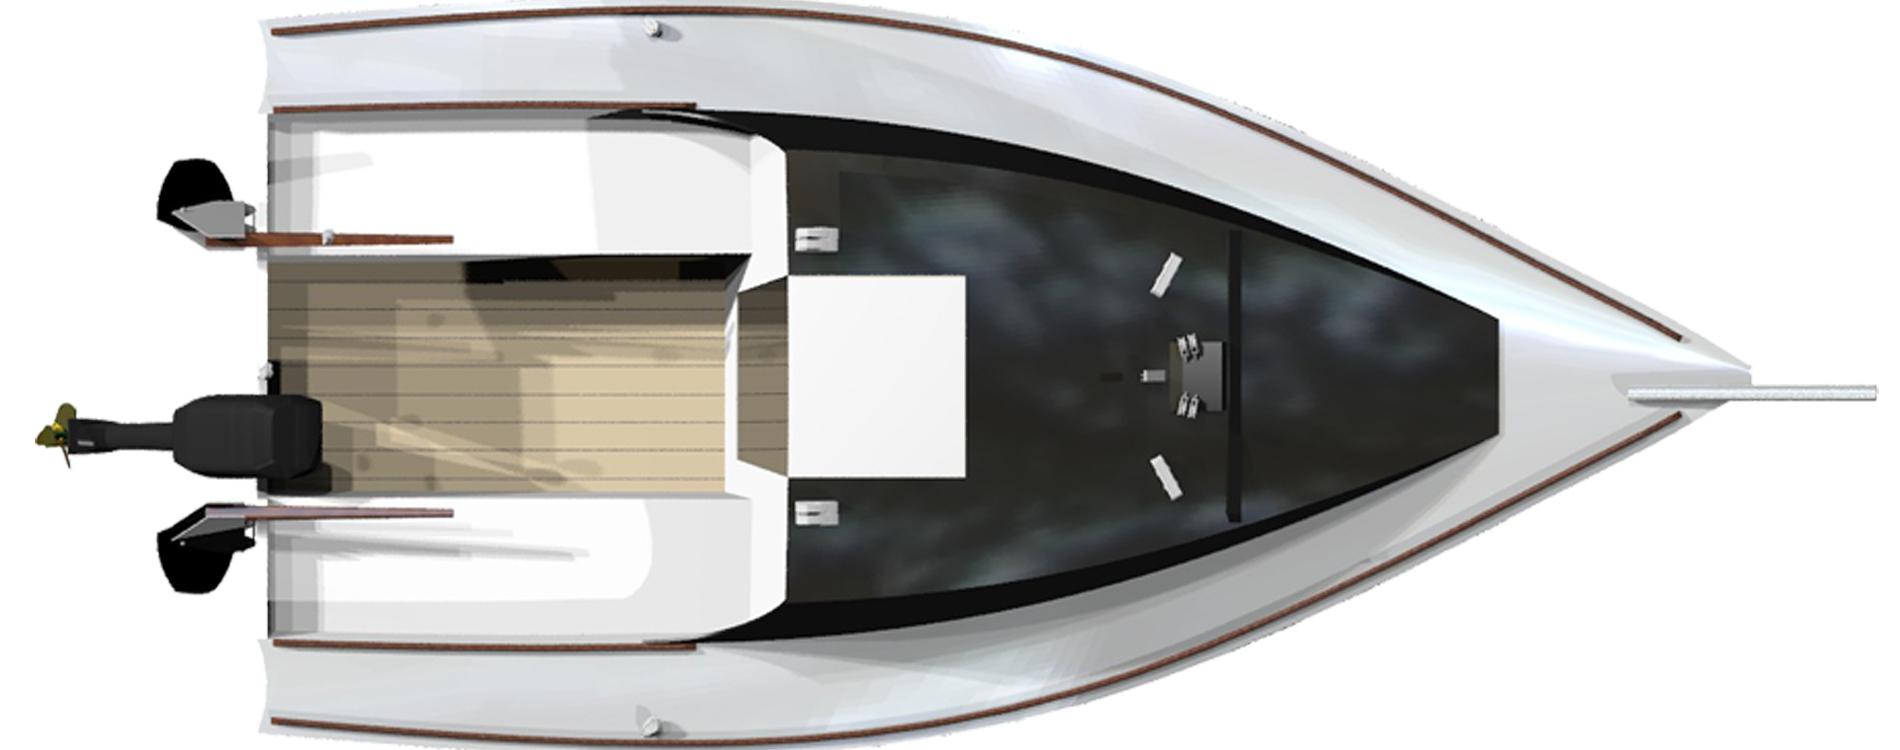 CartOOn400-Voilier-construction amateur-epoxy-microvoilier-Vincent-Lebailly